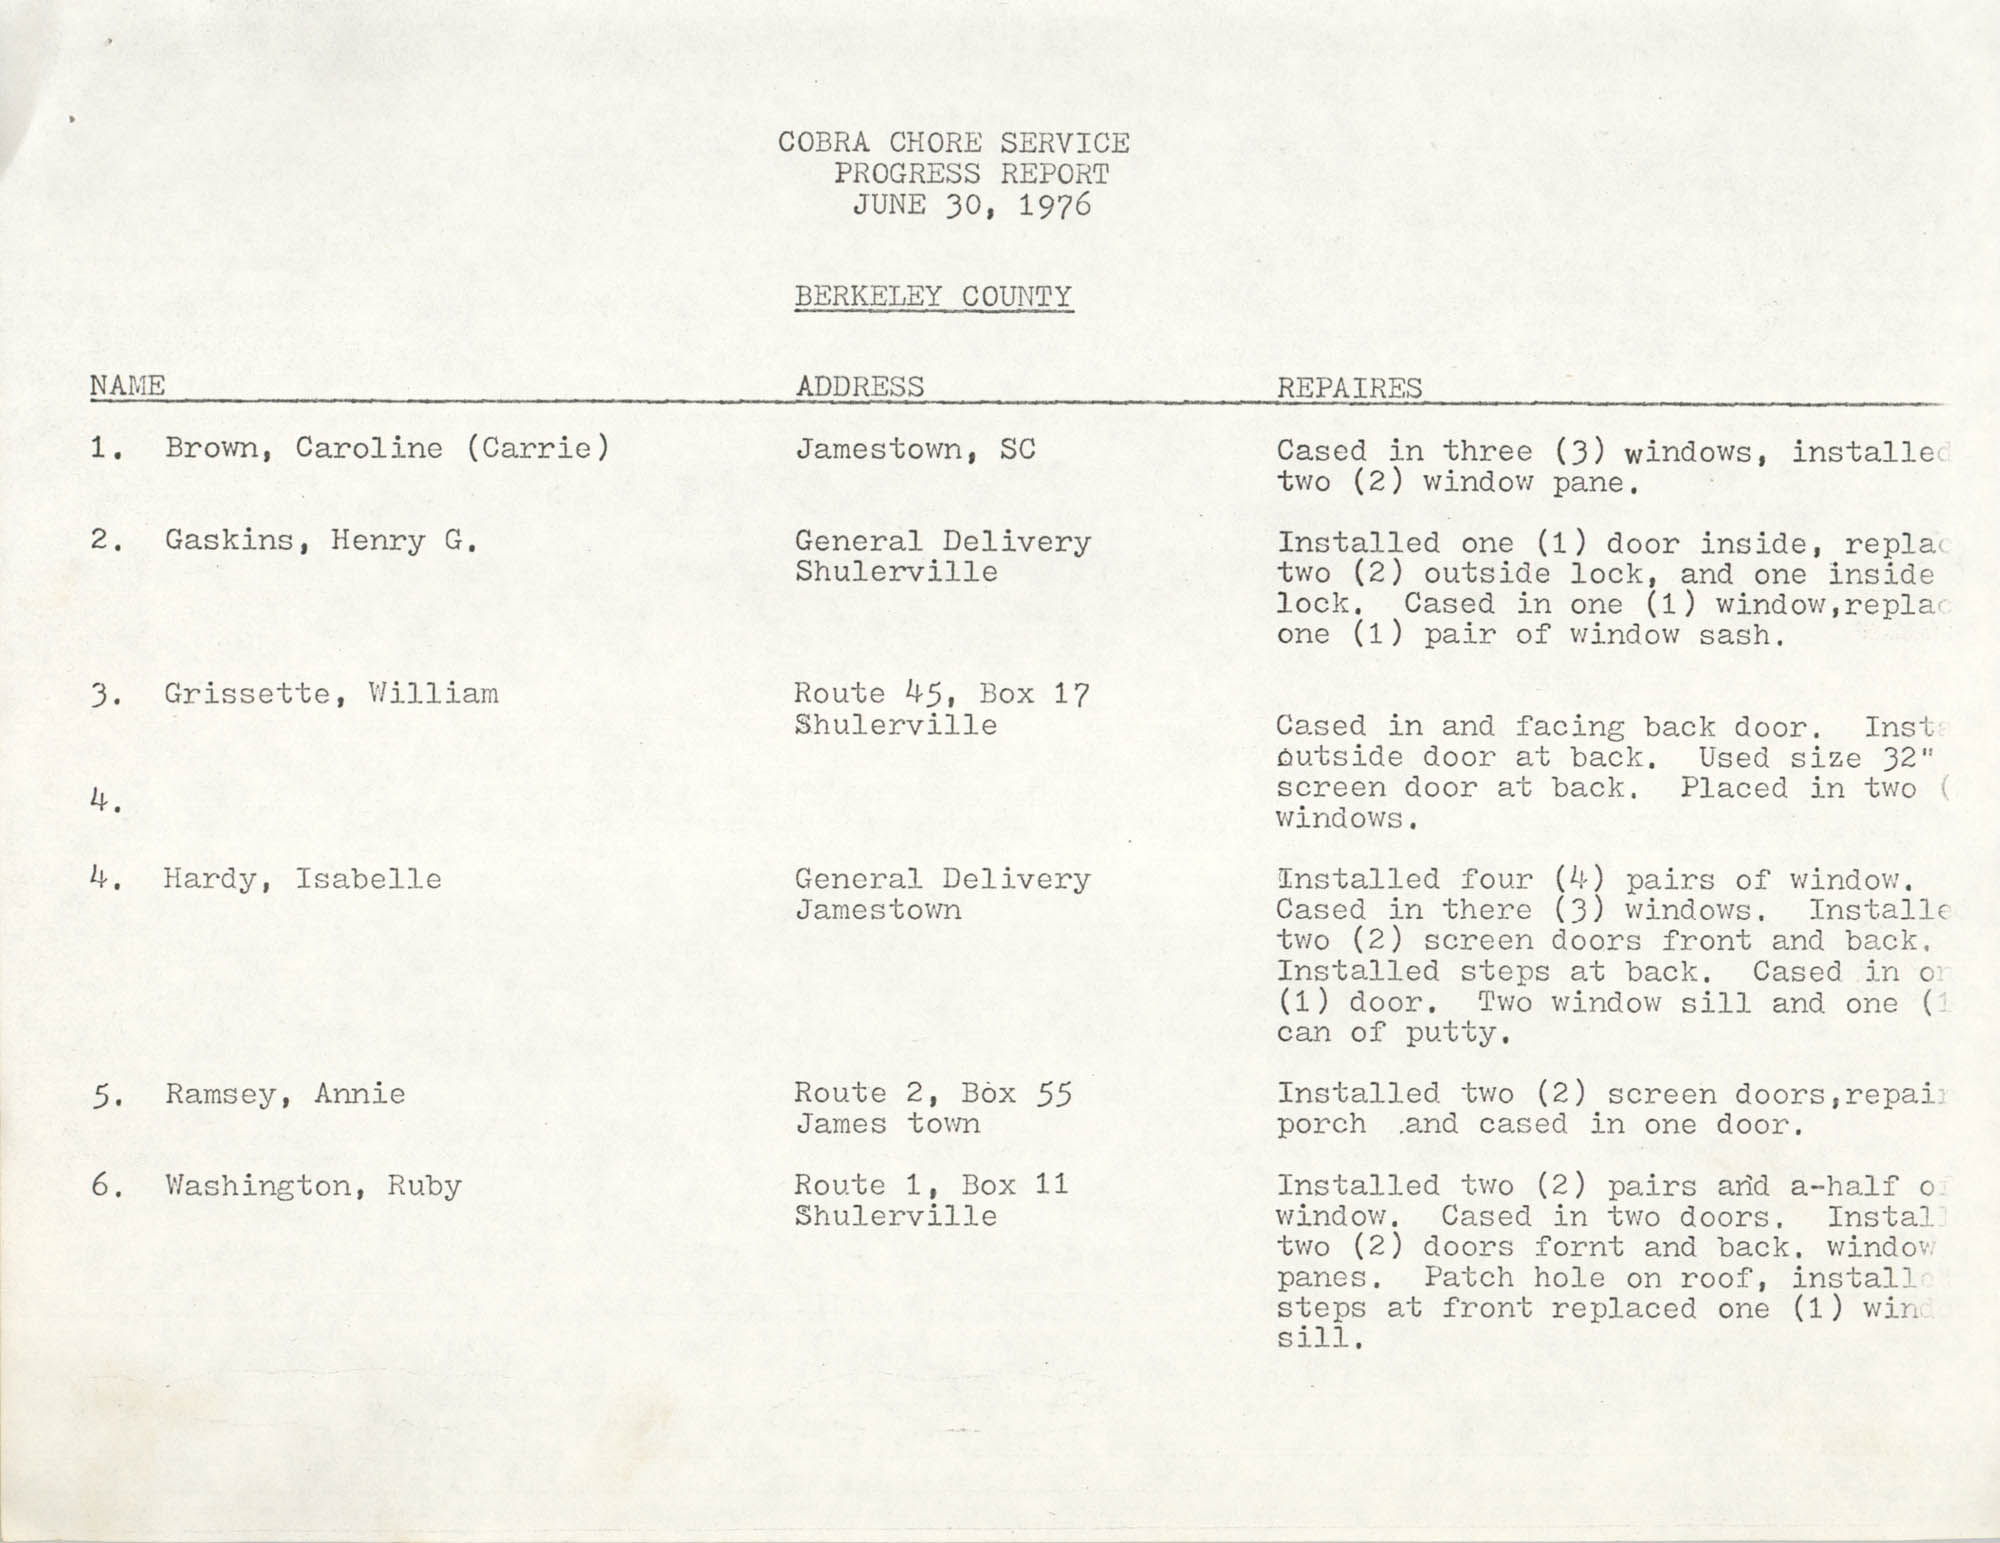 COBRA Chore Services, June 1976, Progress Report, Berkeley County, Page 1